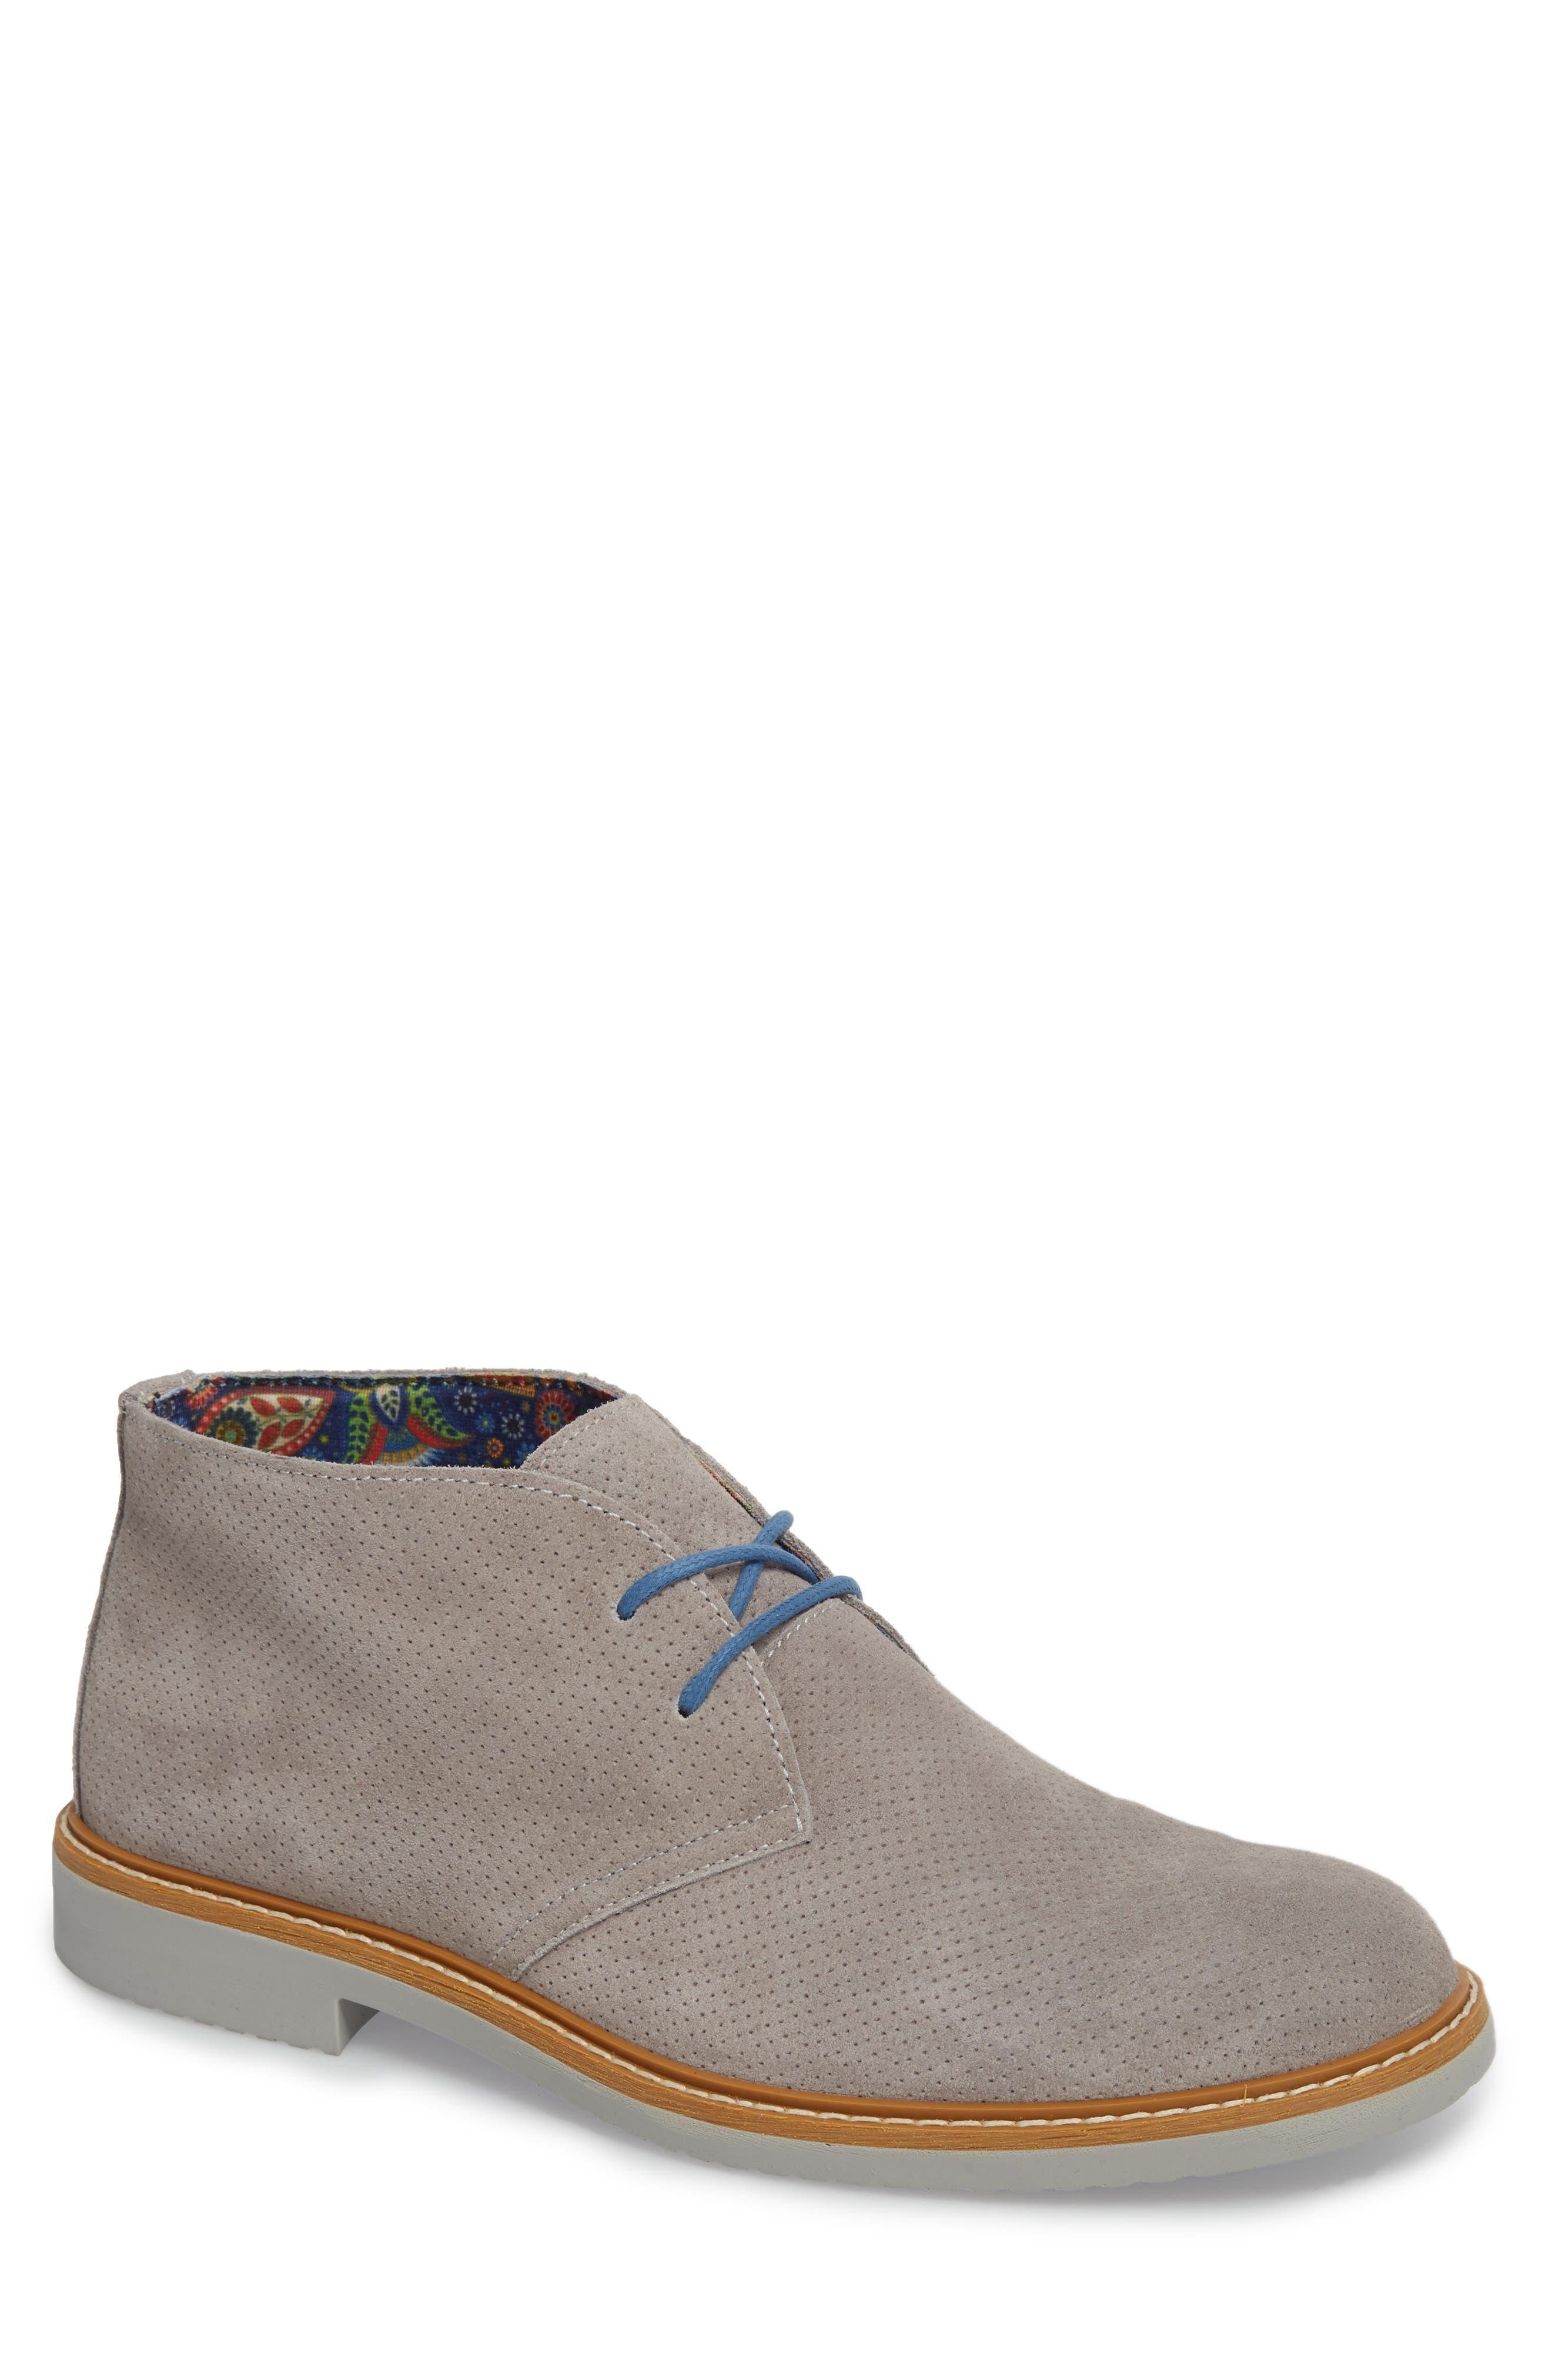 Bayside Perforated Chukka Boot,                         Main,                         color,